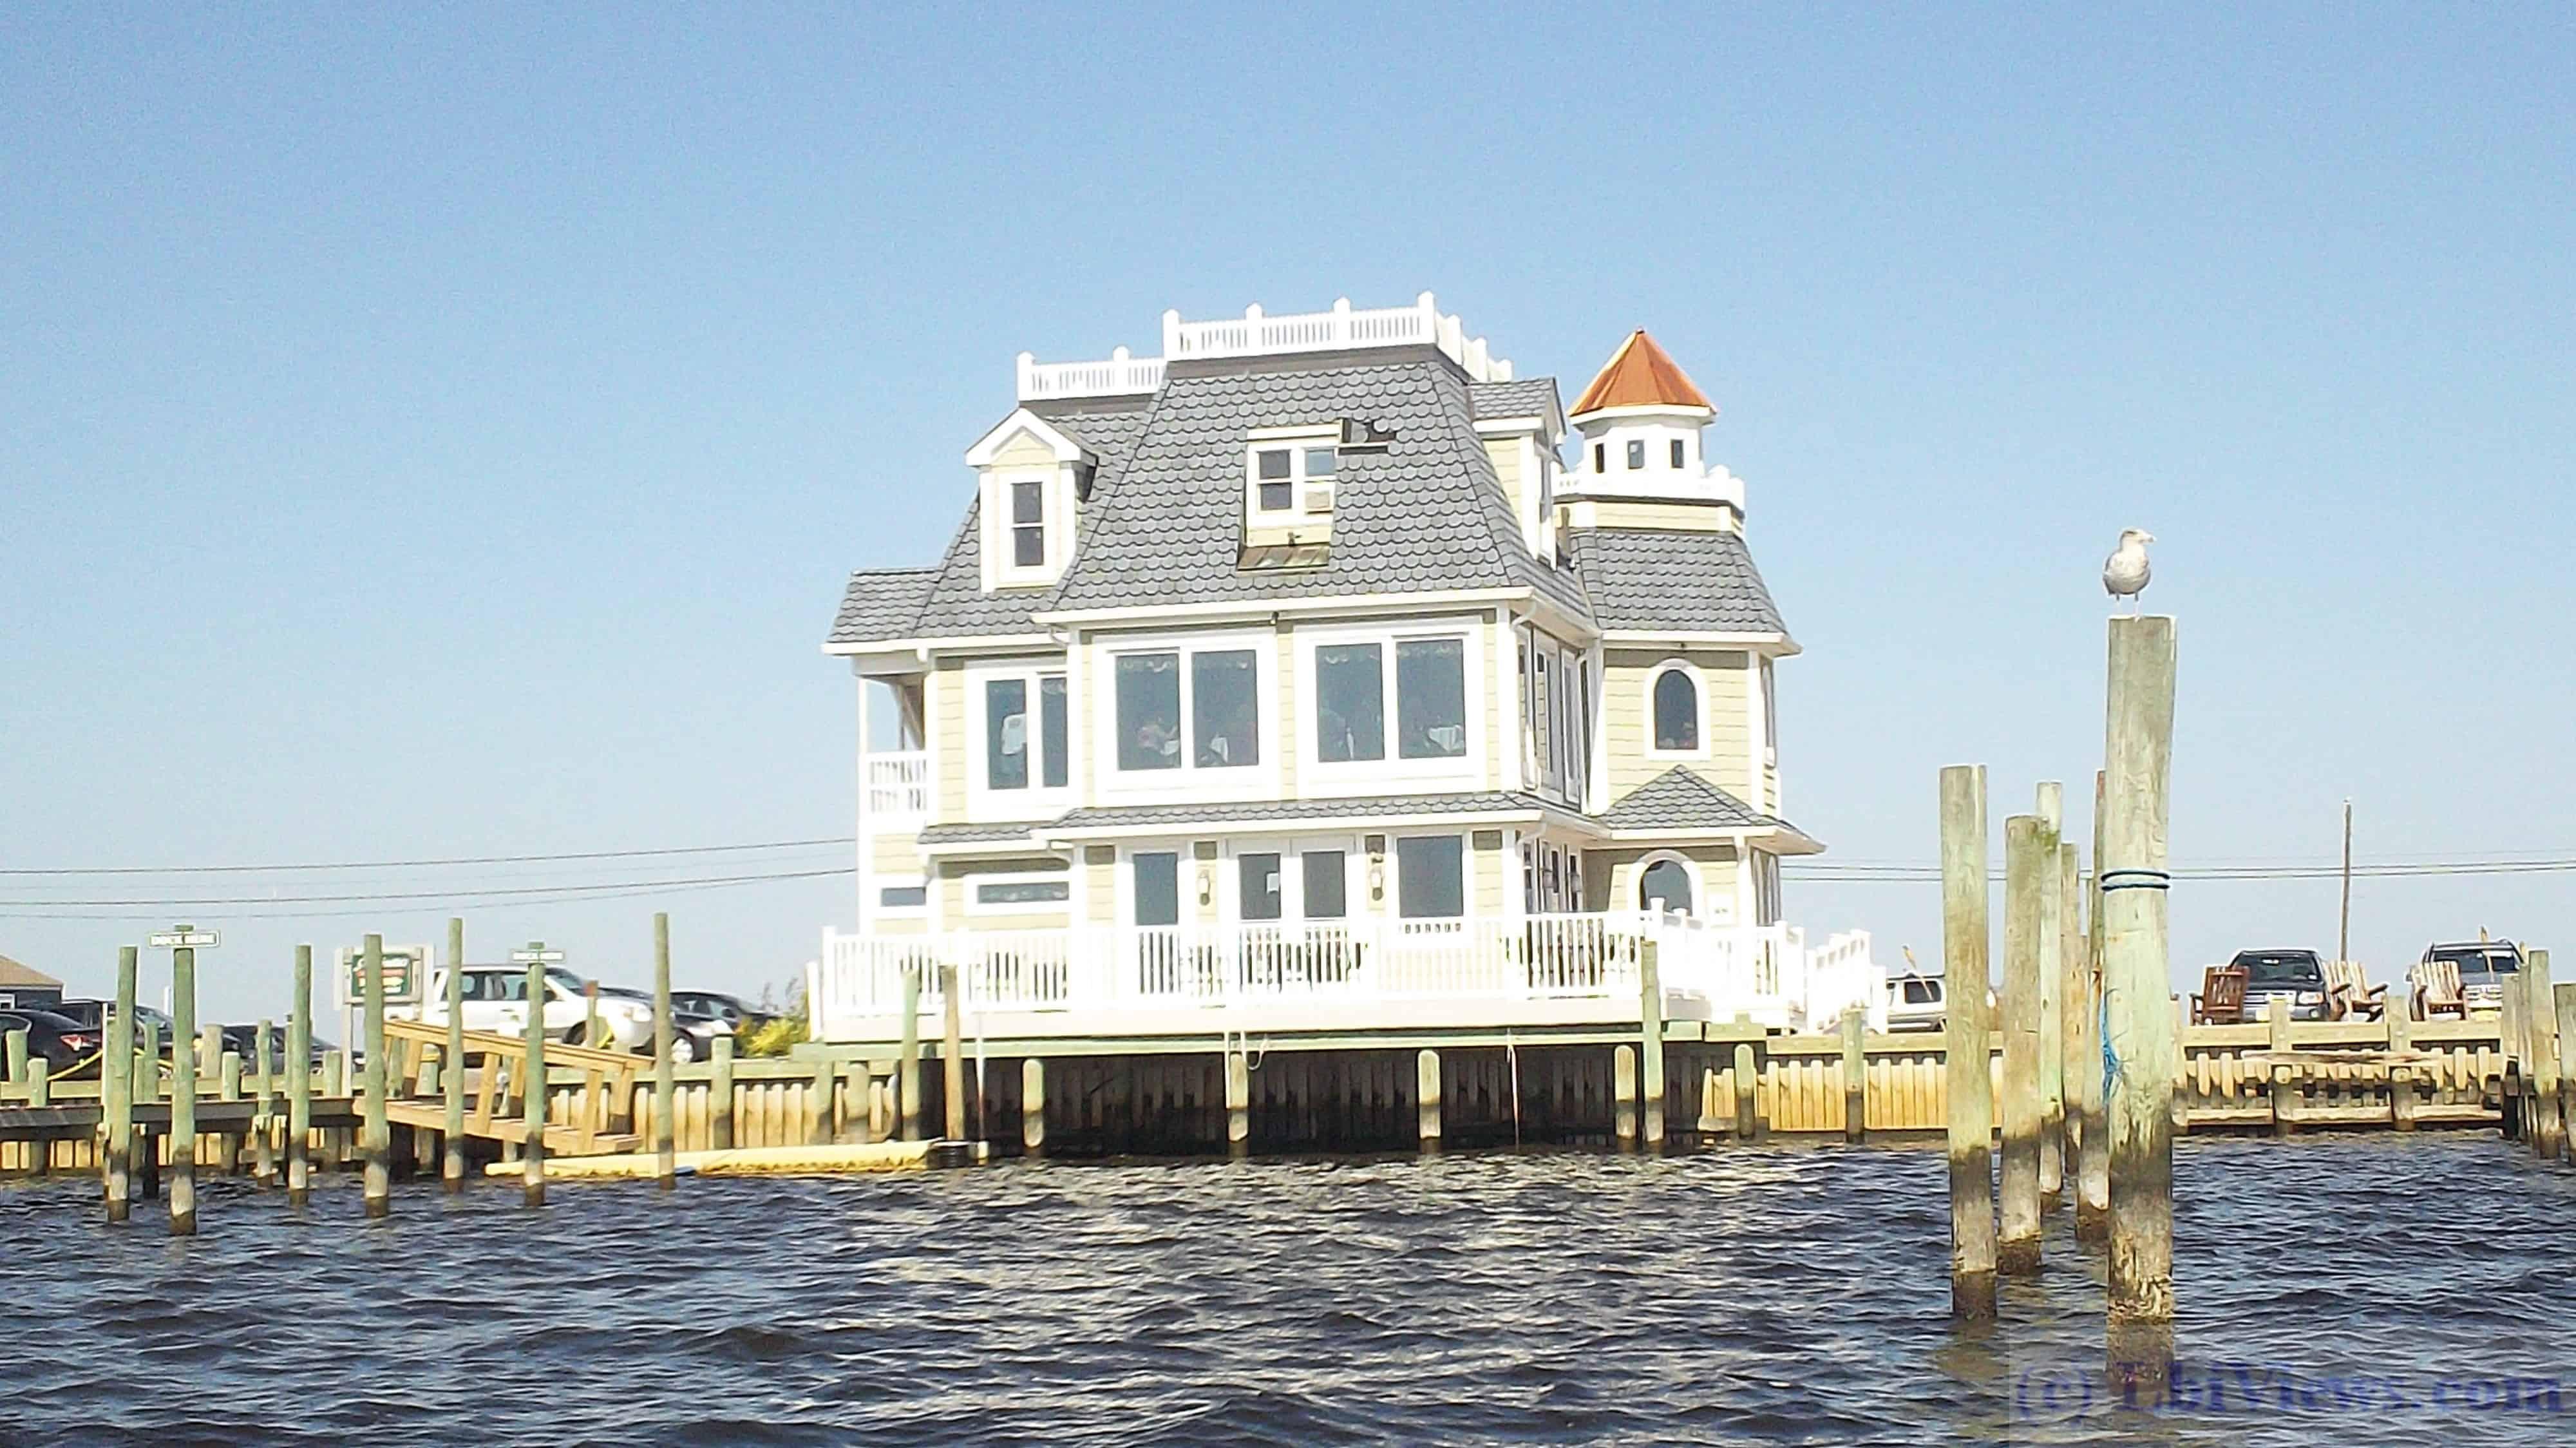 Antoinetta's Restaurant on the bay in West Creek NJ